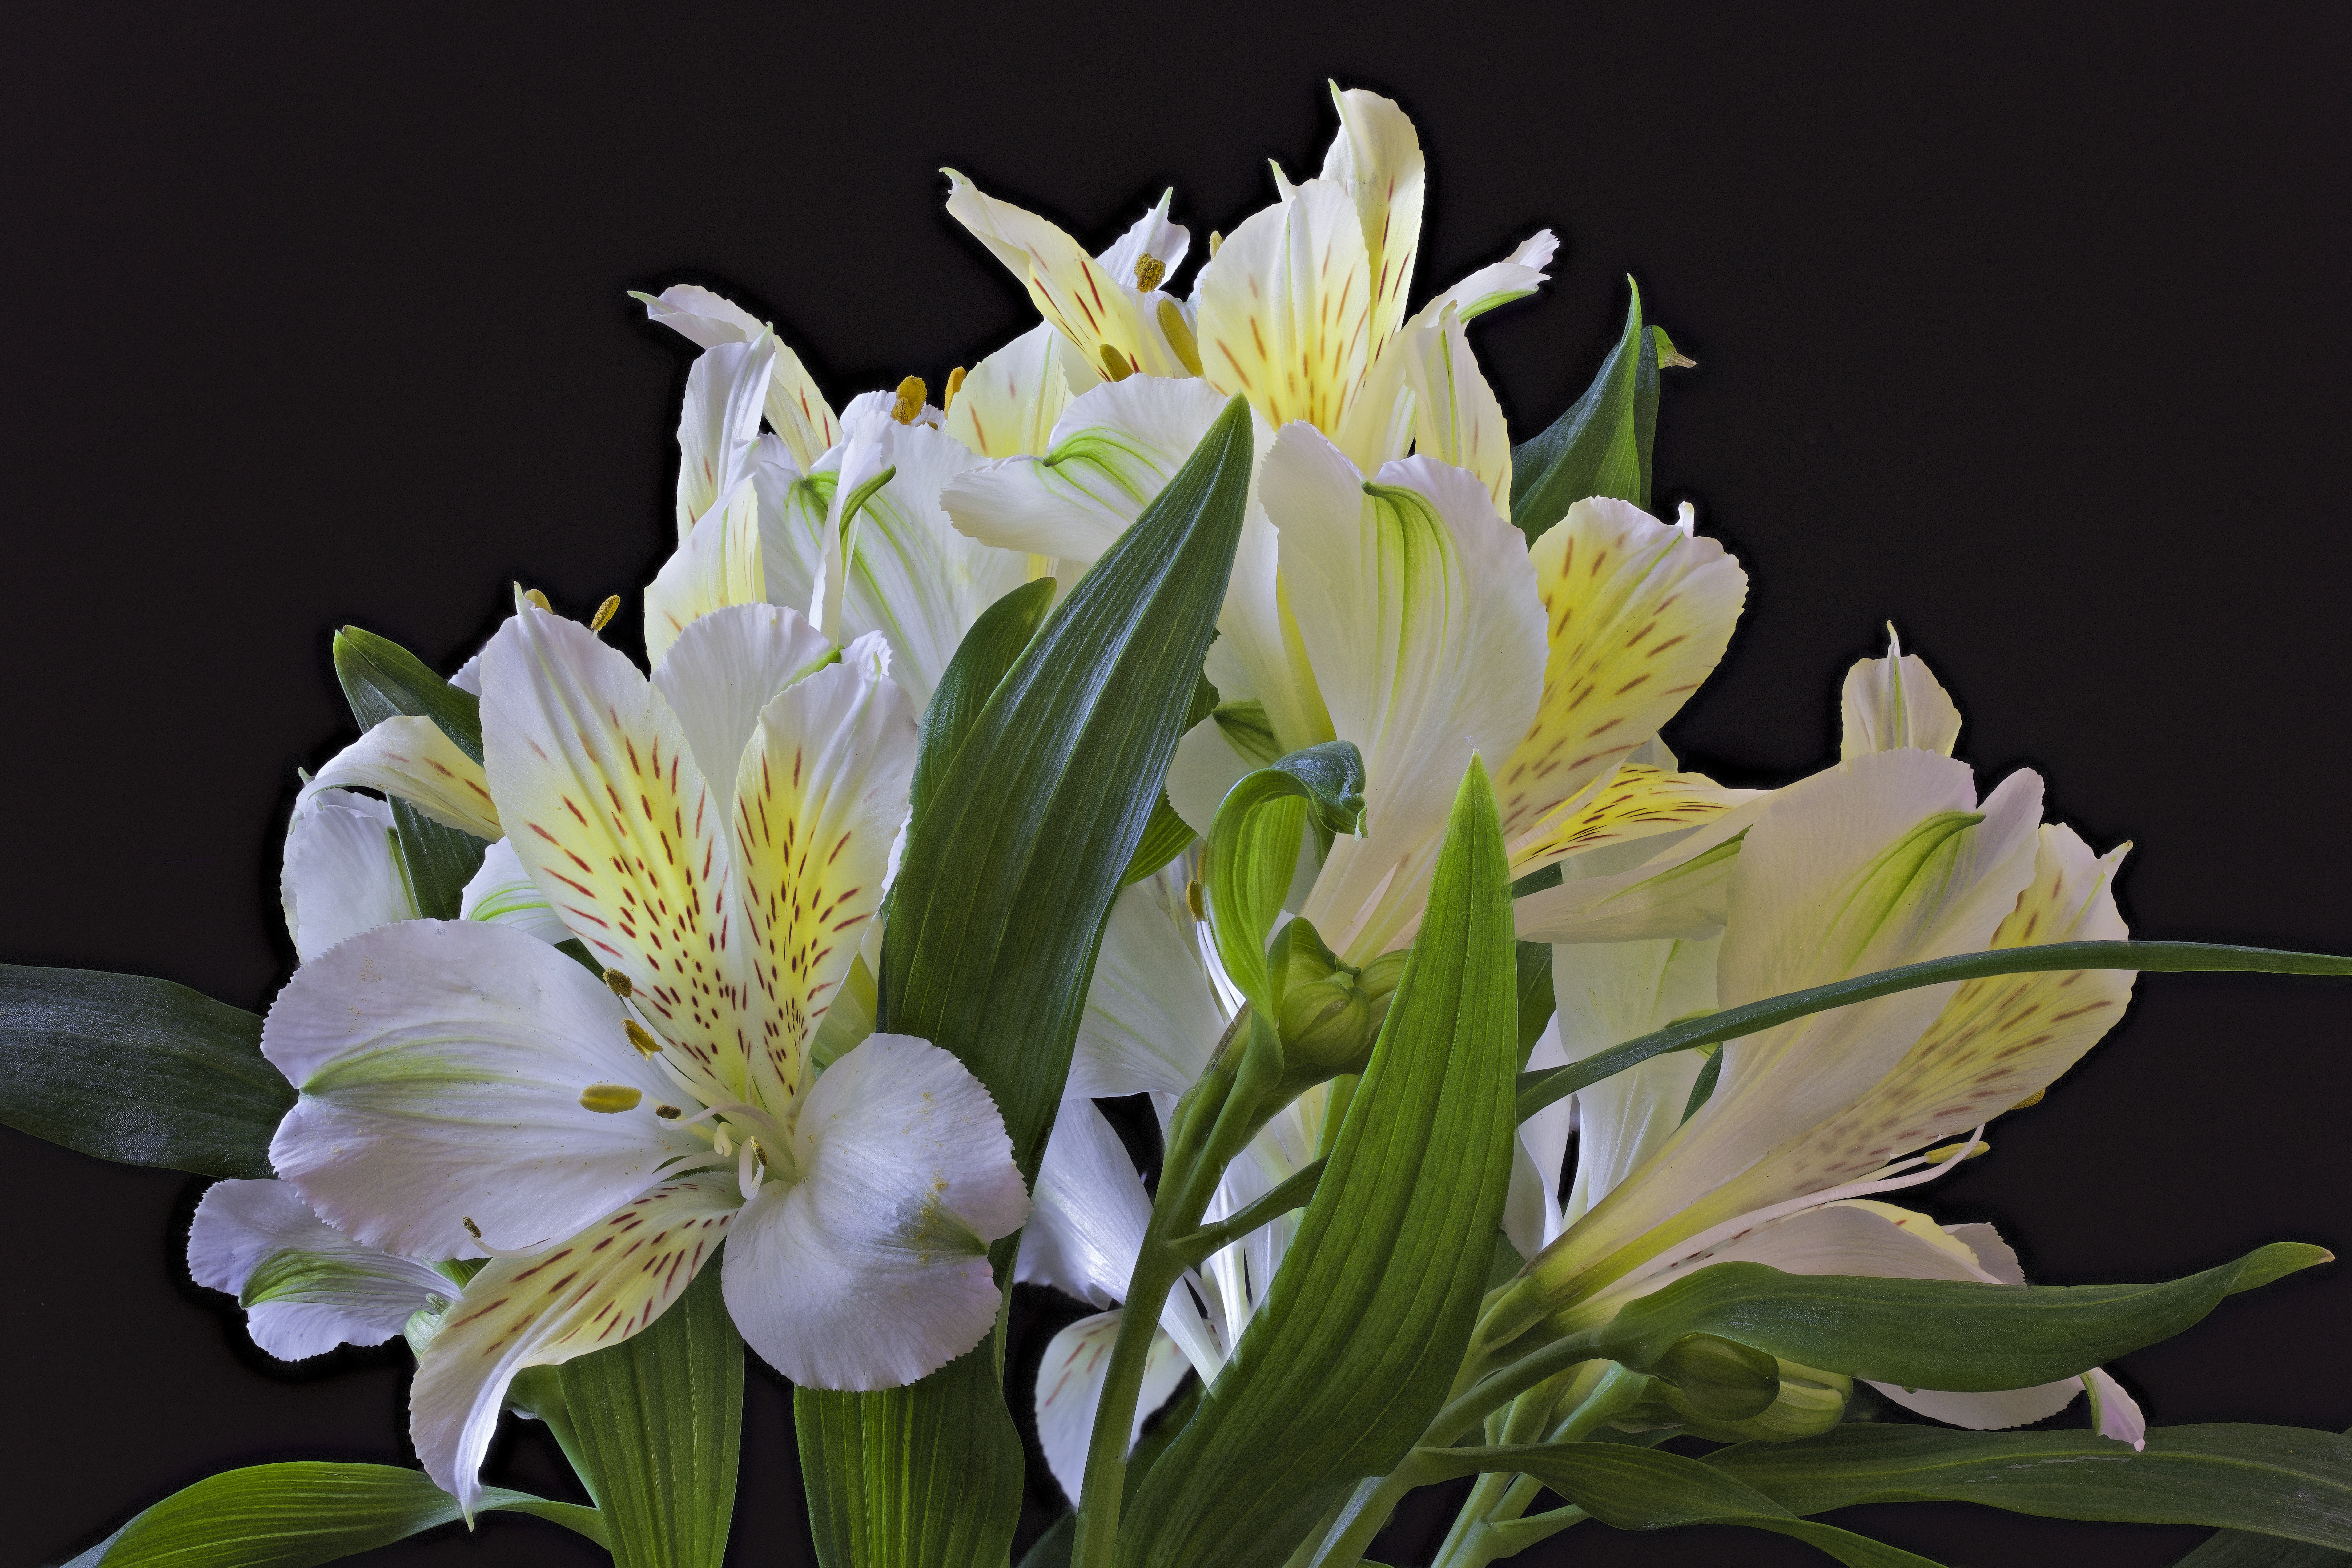 Lilies Flowers Bouquet Black Background Peruvian Lily